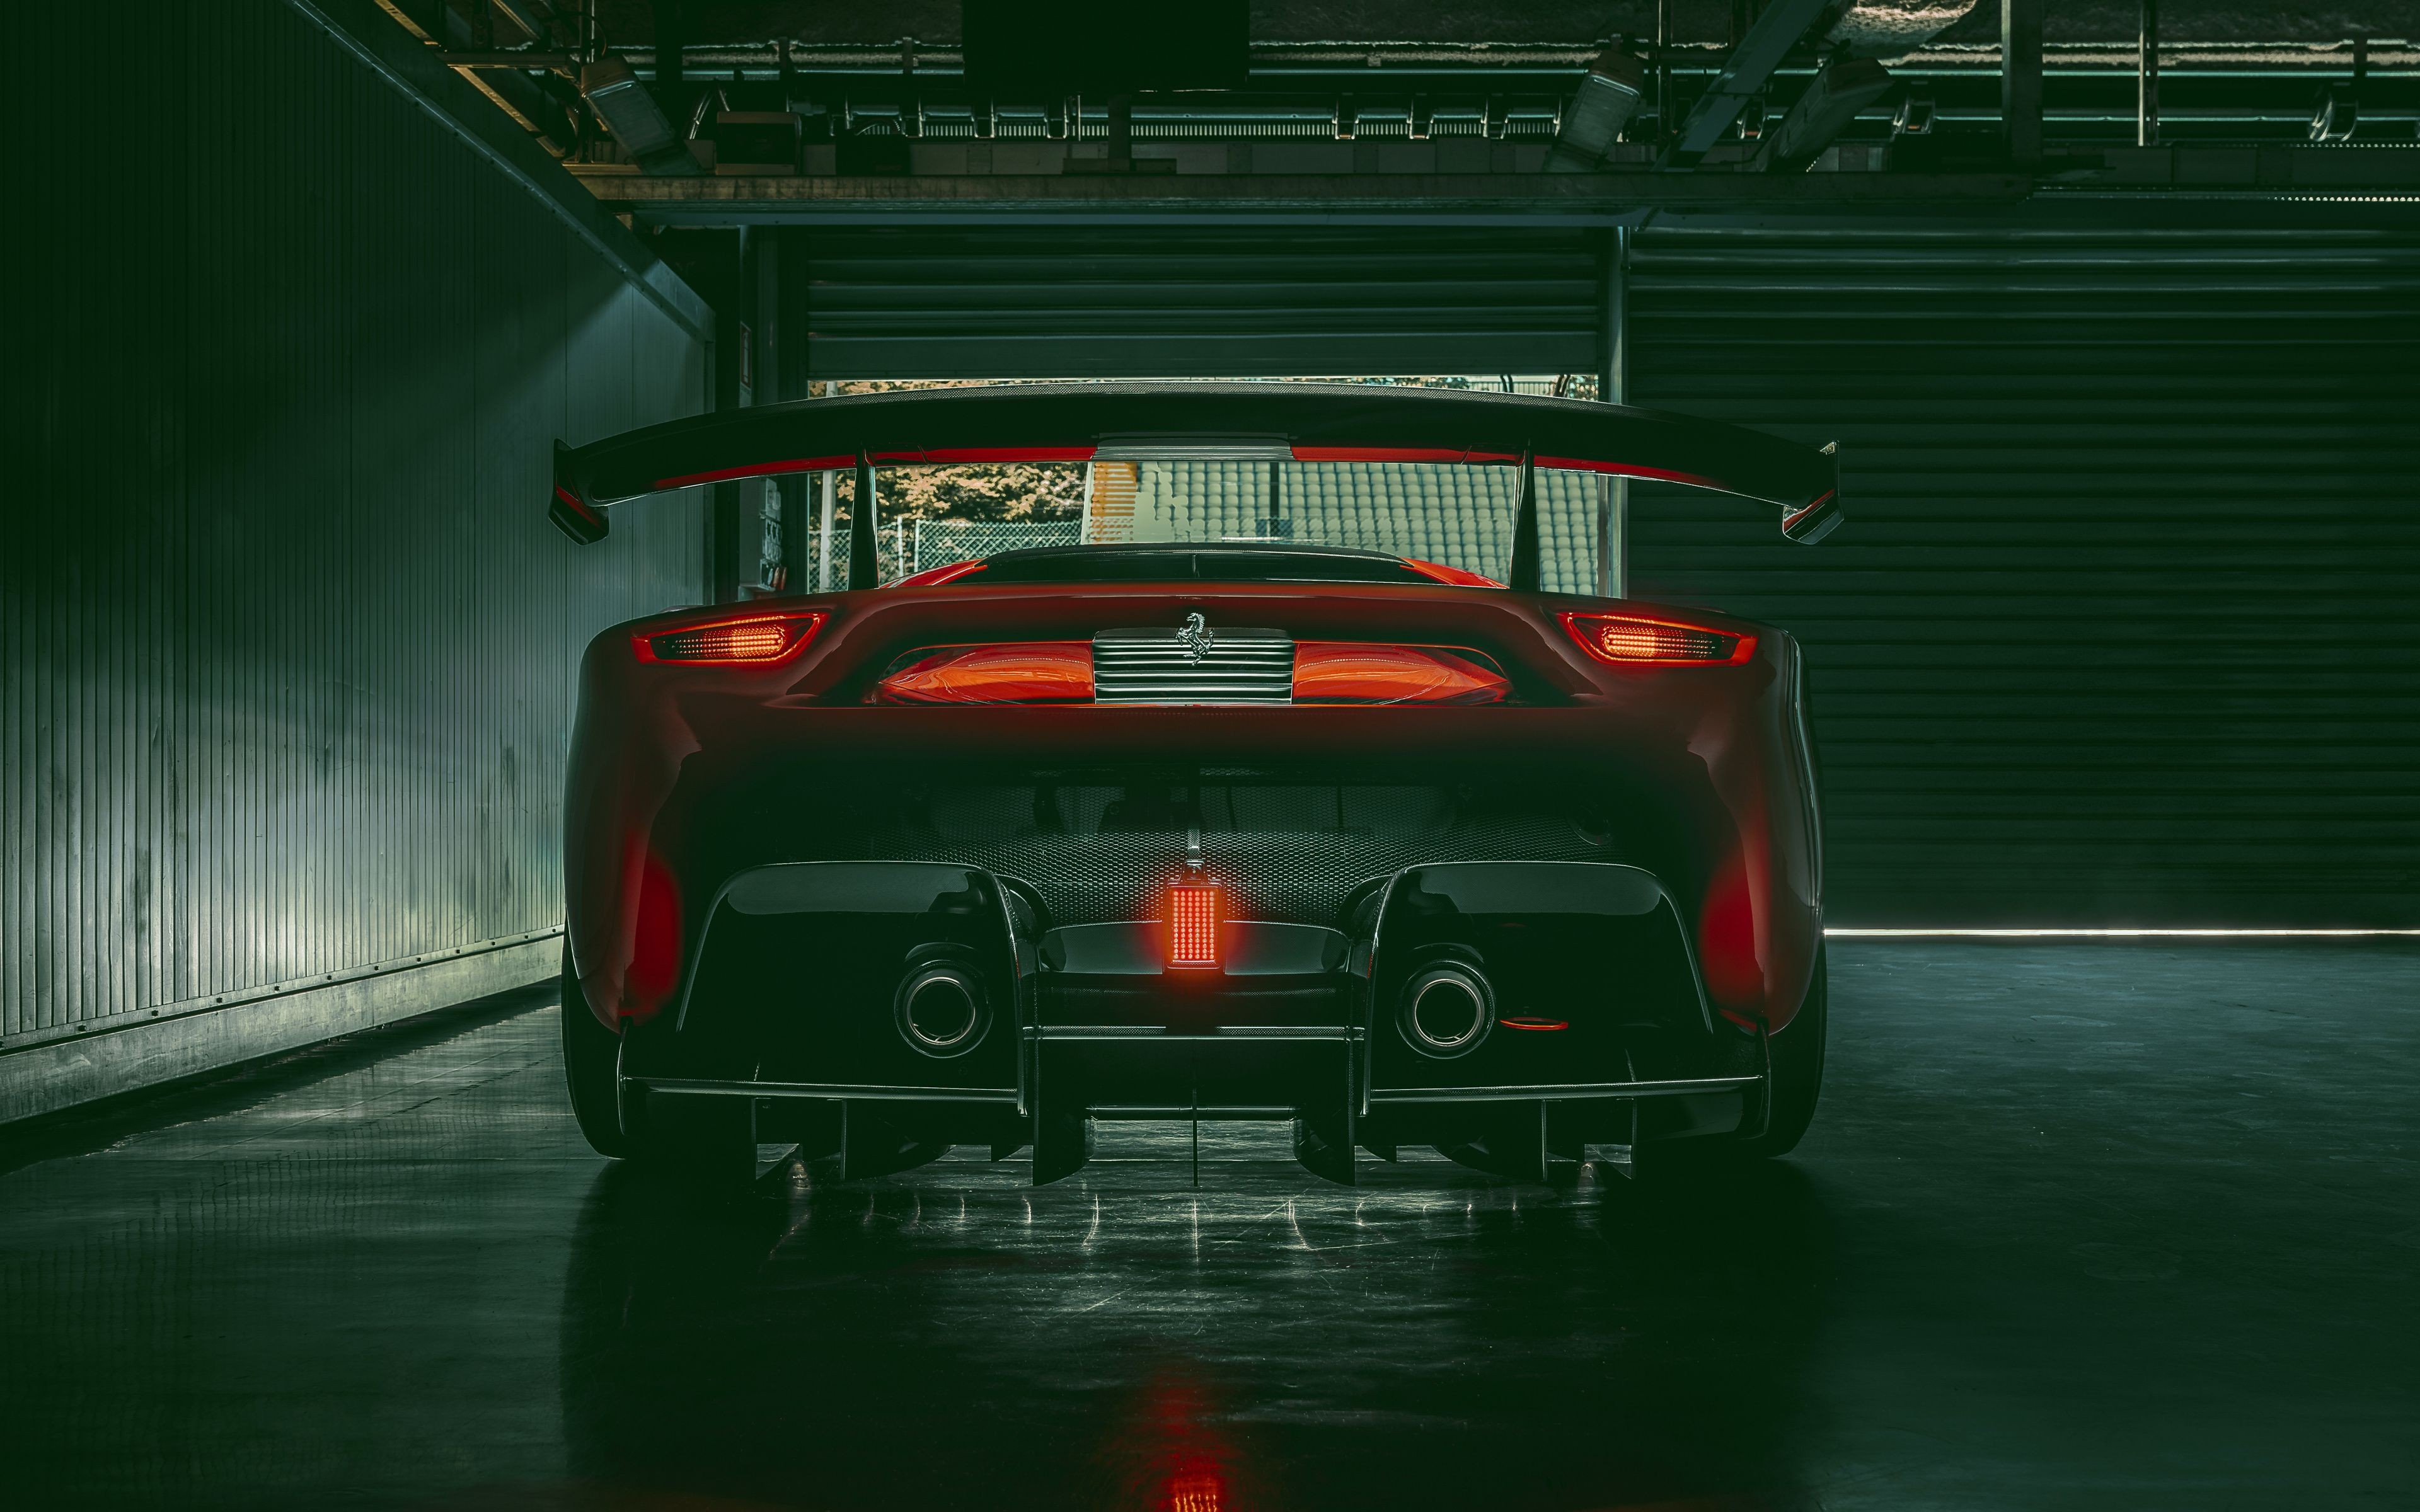 3840x2400 Rear View Ferrari P80c 2019 Car Wallpaper Car Wallpapers Rear View Views 2018 hyundai le fil rouge 4k 2